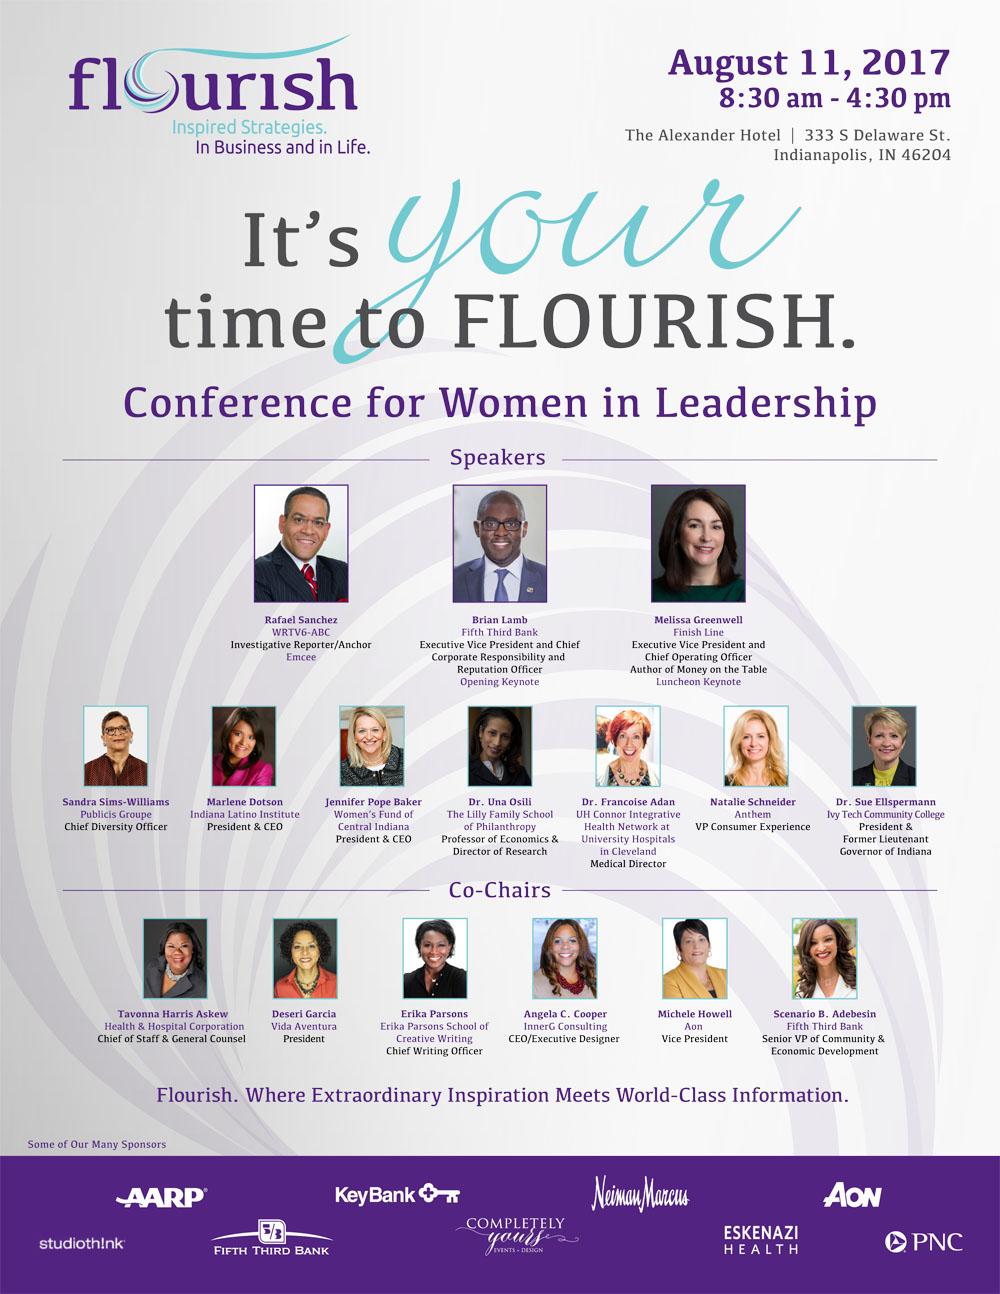 2017 Flourish Indy Speakers